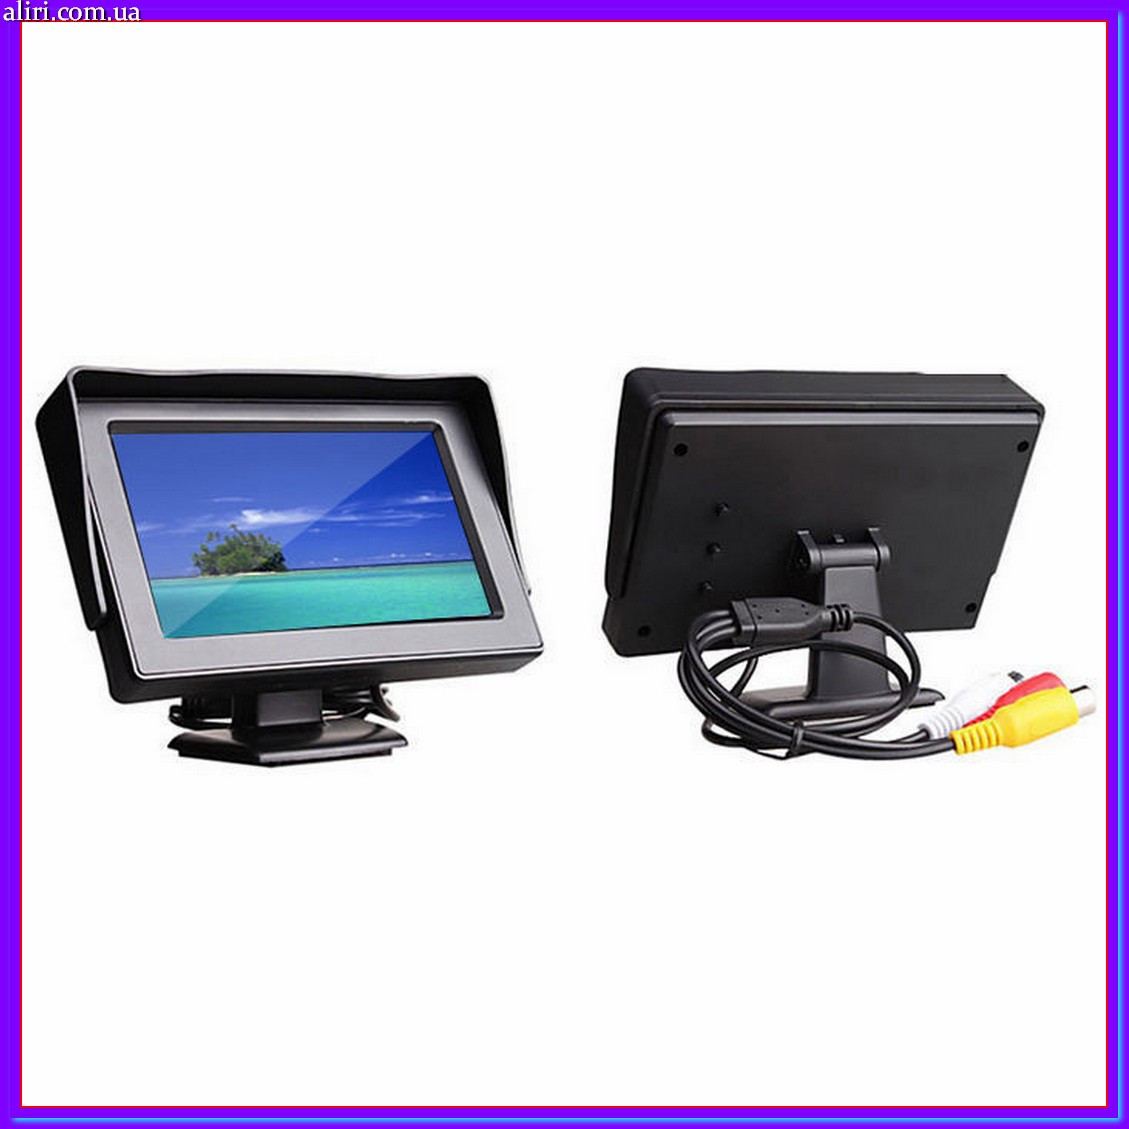 Автомонитор 4,3'' Car Rearview Monitor монитор для авто